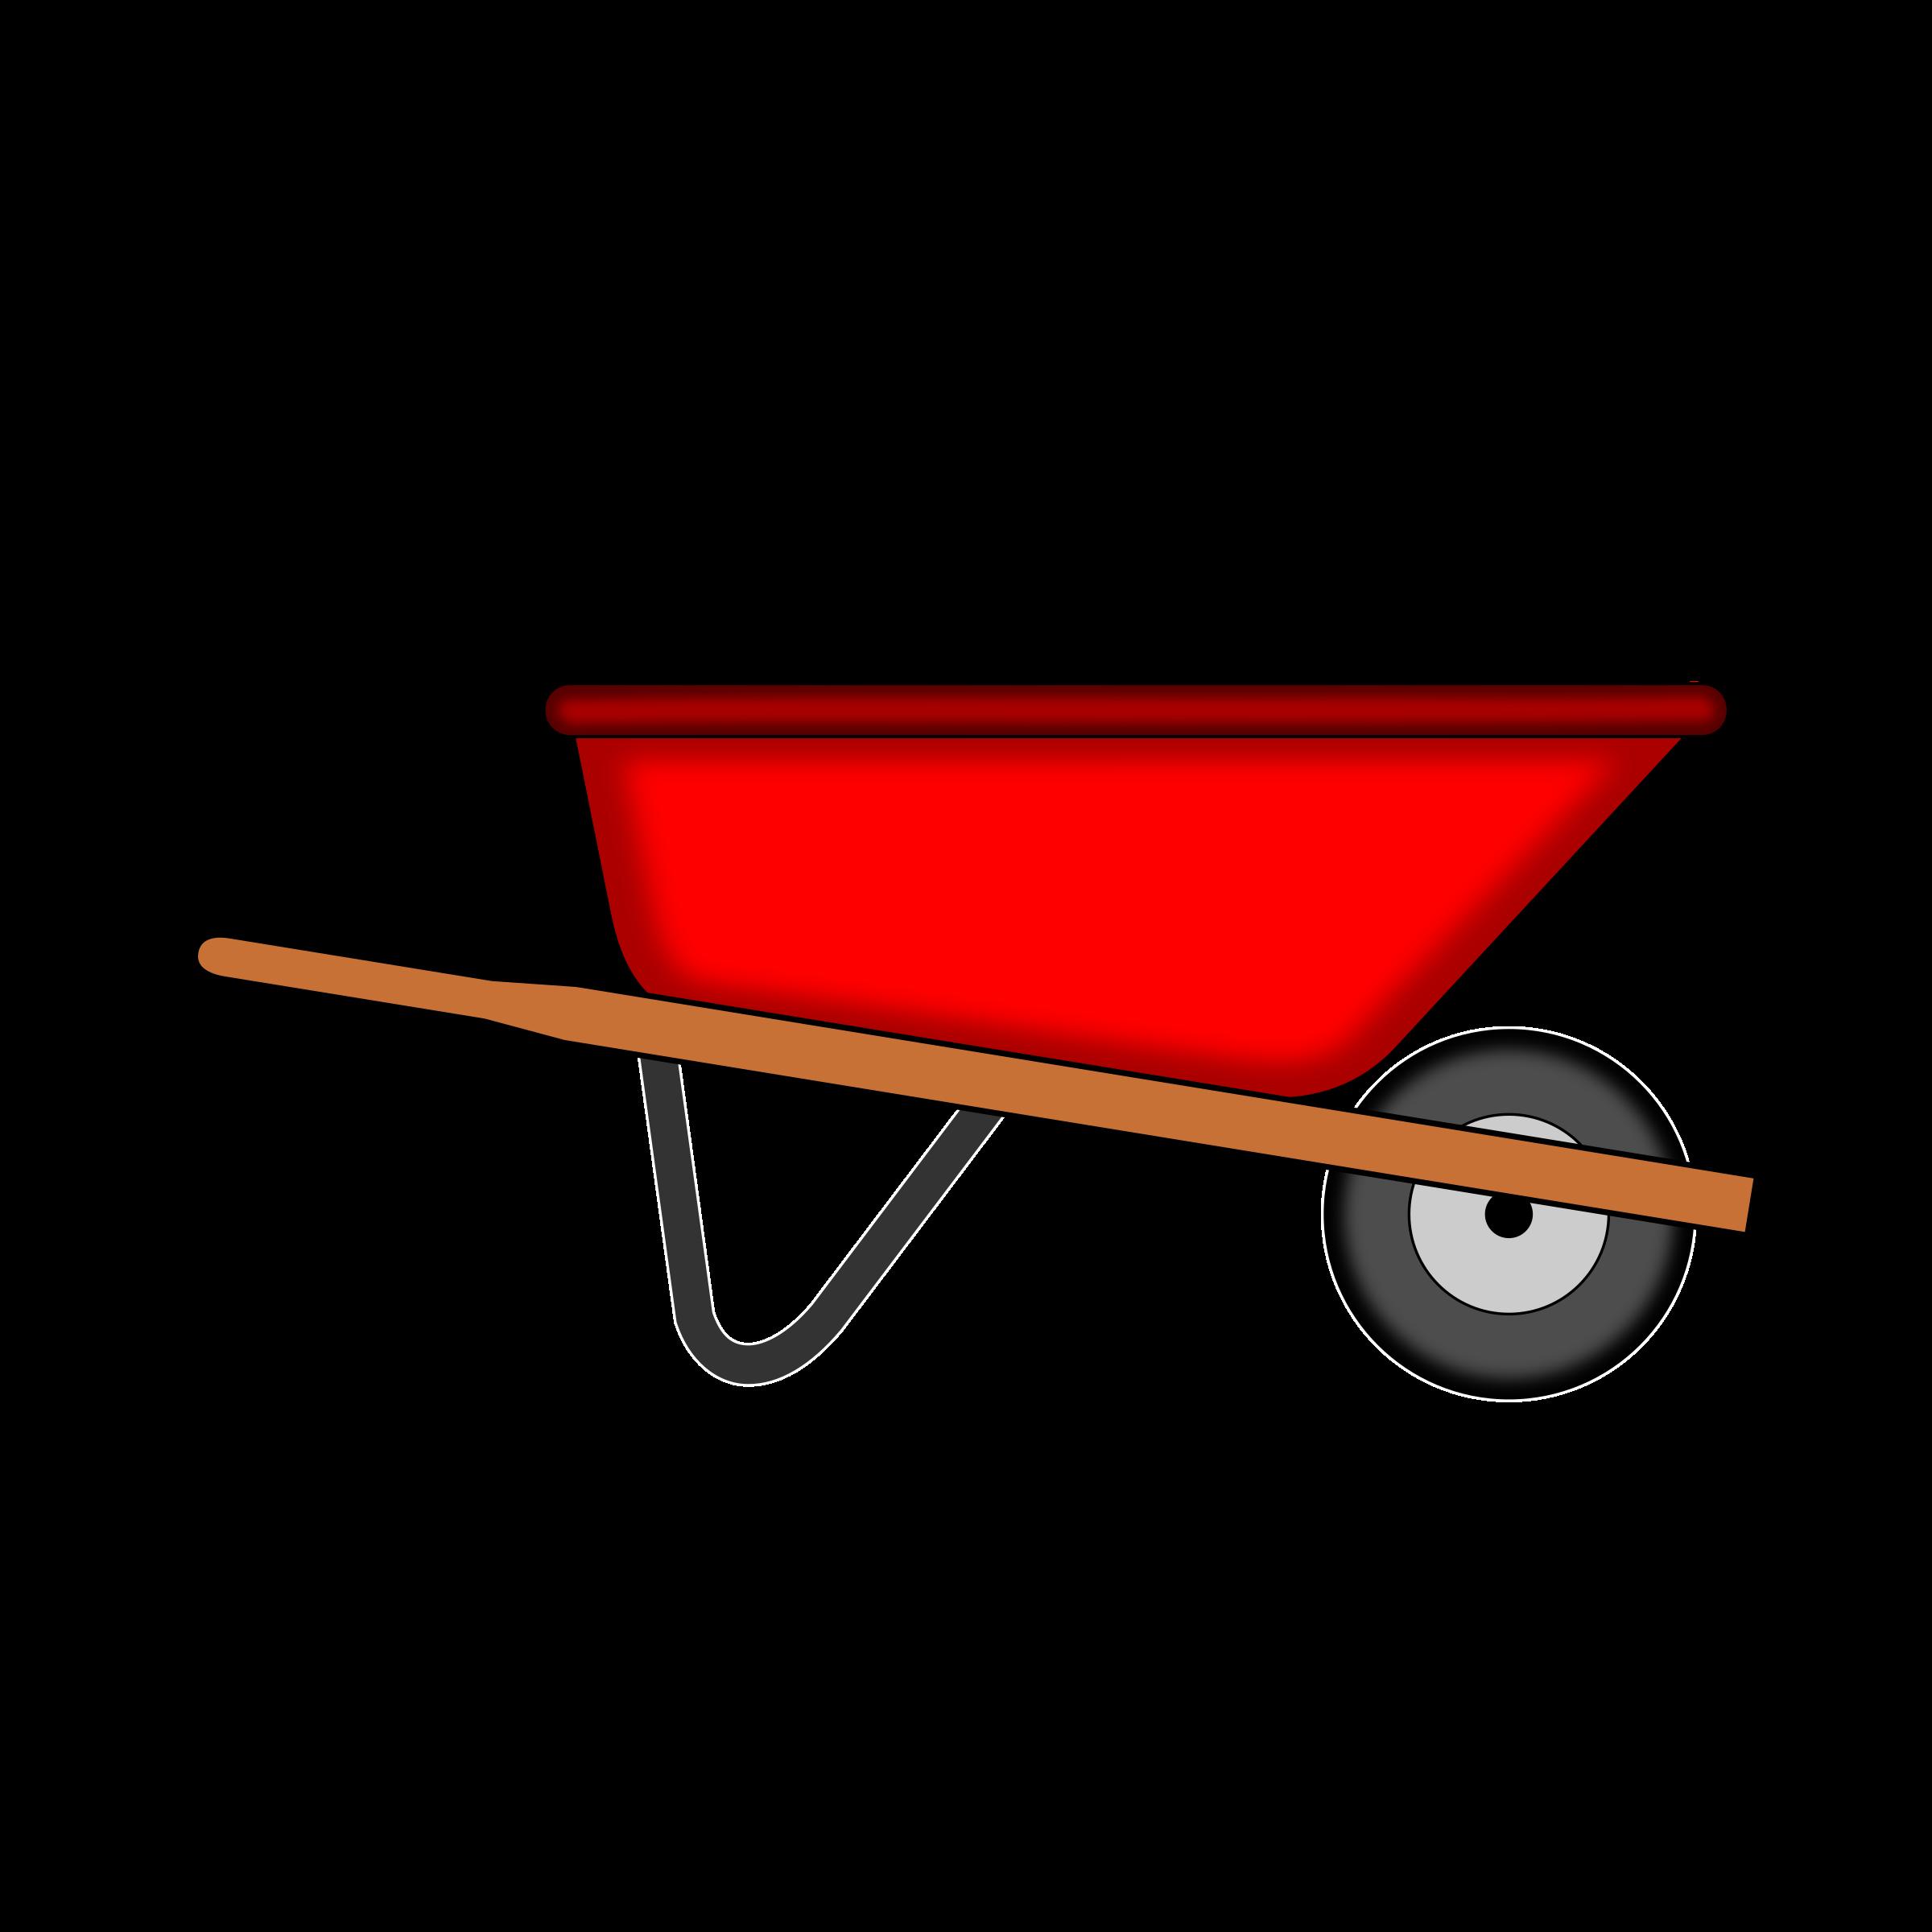 2400x2400 Red Wheelbarrow Vector Clipart Image